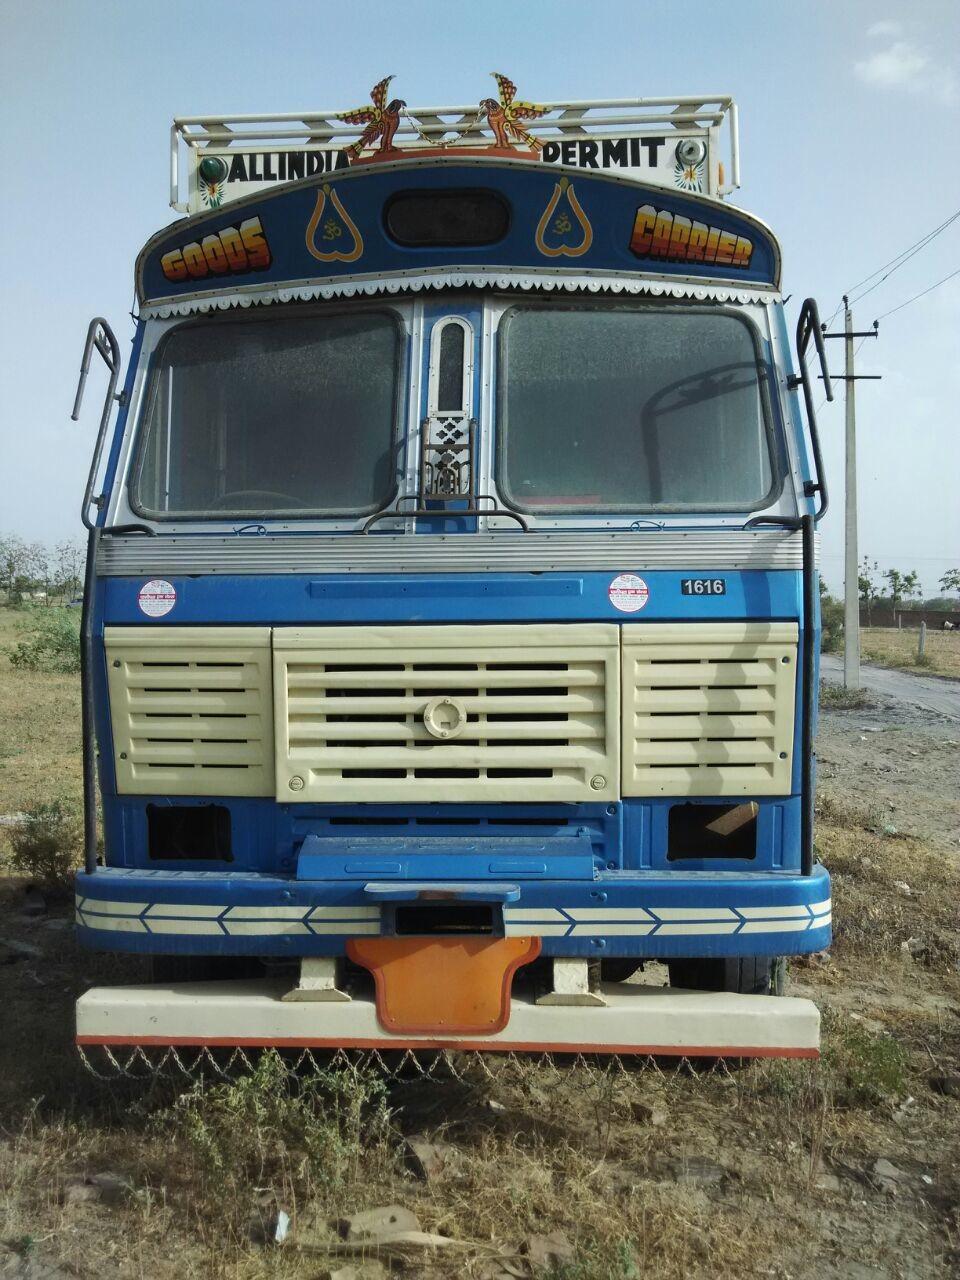 Tipper Ashok Leyland 2518H, Tata 2518 LPK,2518 Hywa,AMW 2518, Toyota Etios,  Mahindra & Mahindra Bolero SLX, Chevrolet Tavera, Tata Safari, Tata Star  Bus 22, ...